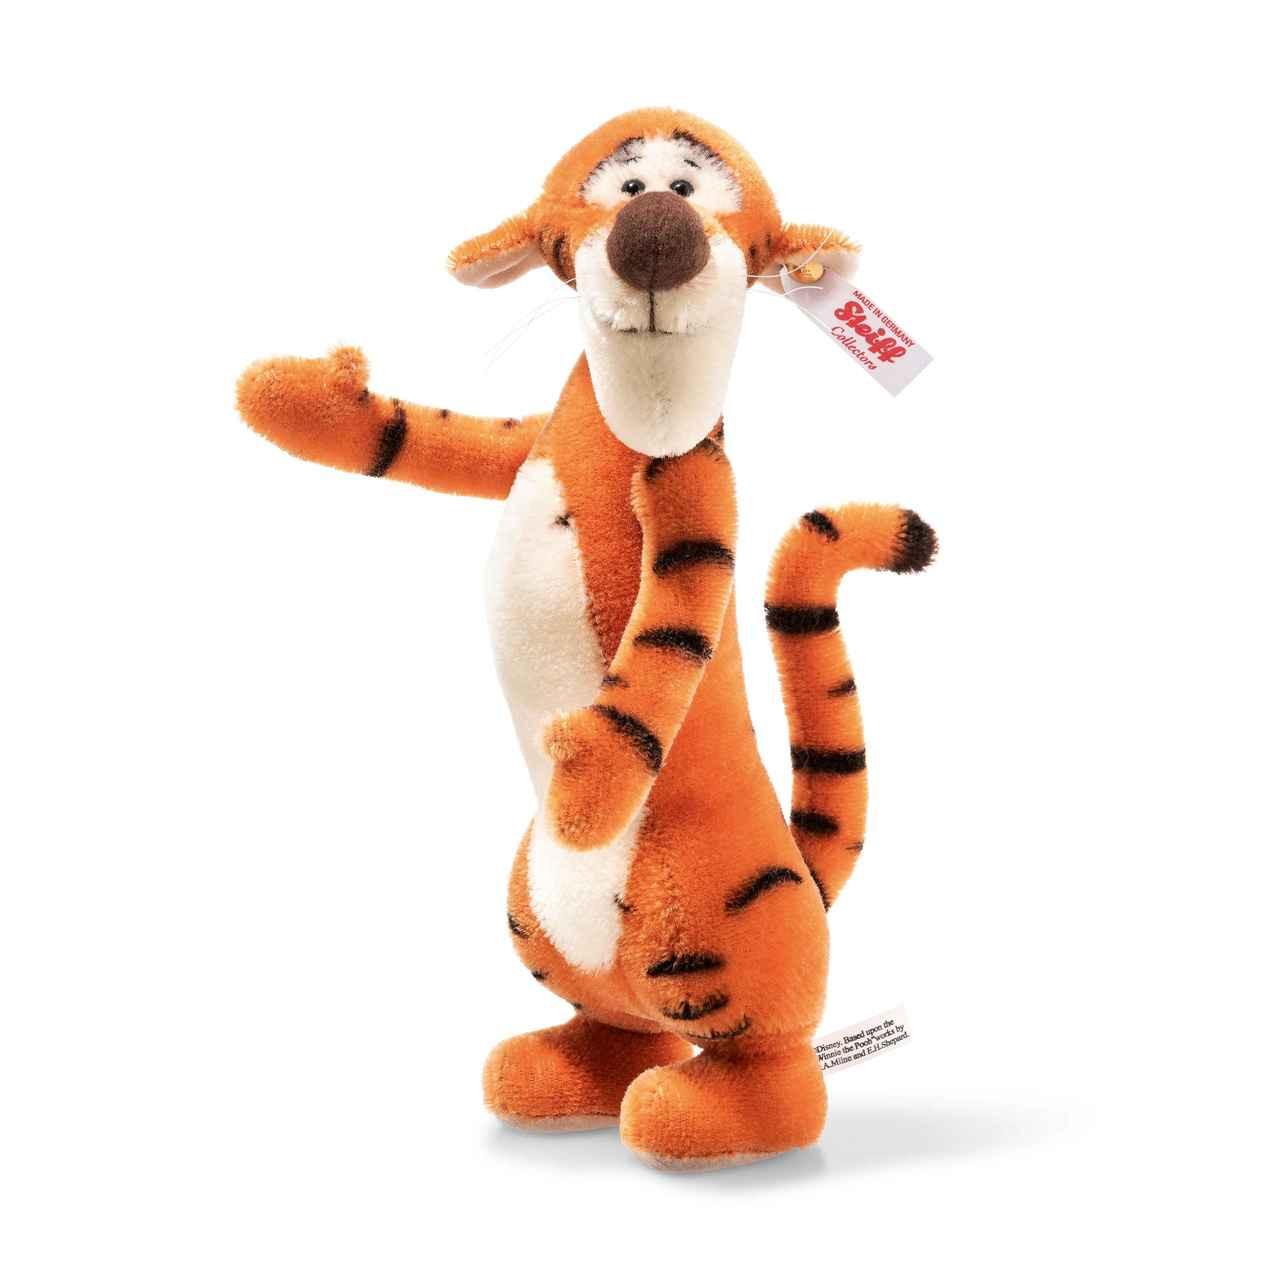 003854469600e Disney Miniature Tigger - Steiff USA - EAN 683664